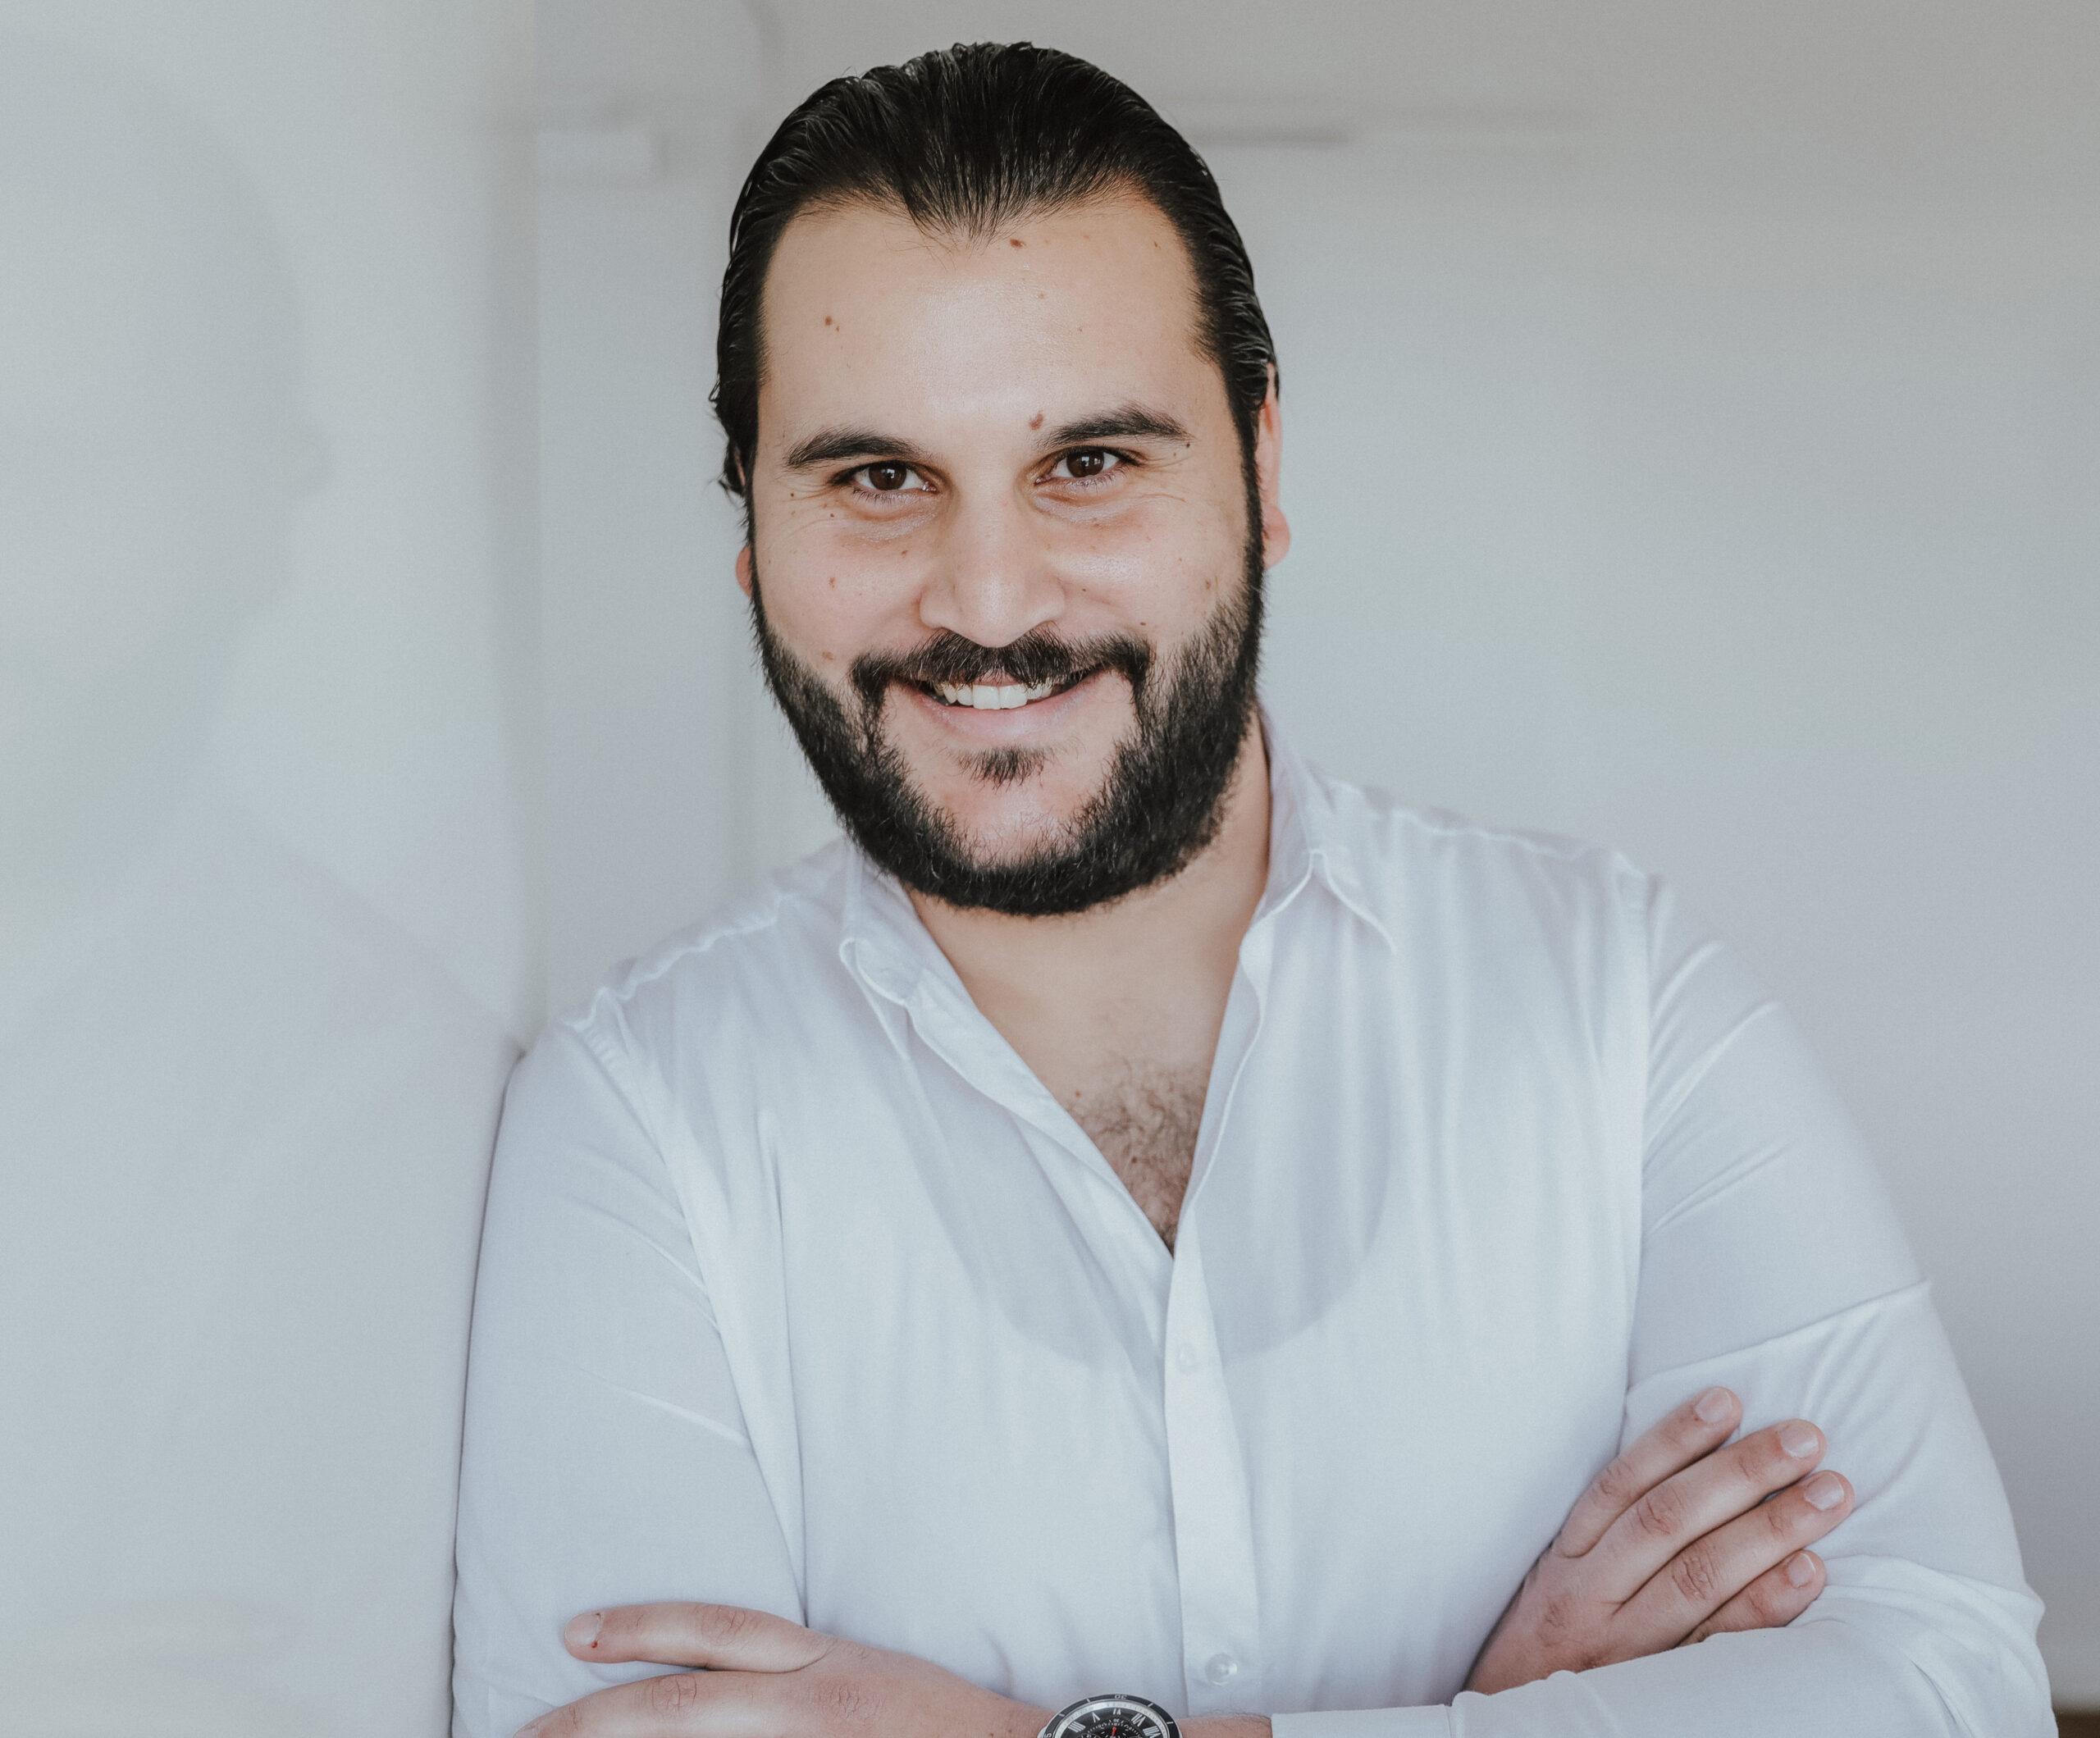 Ahmad Massaadeh